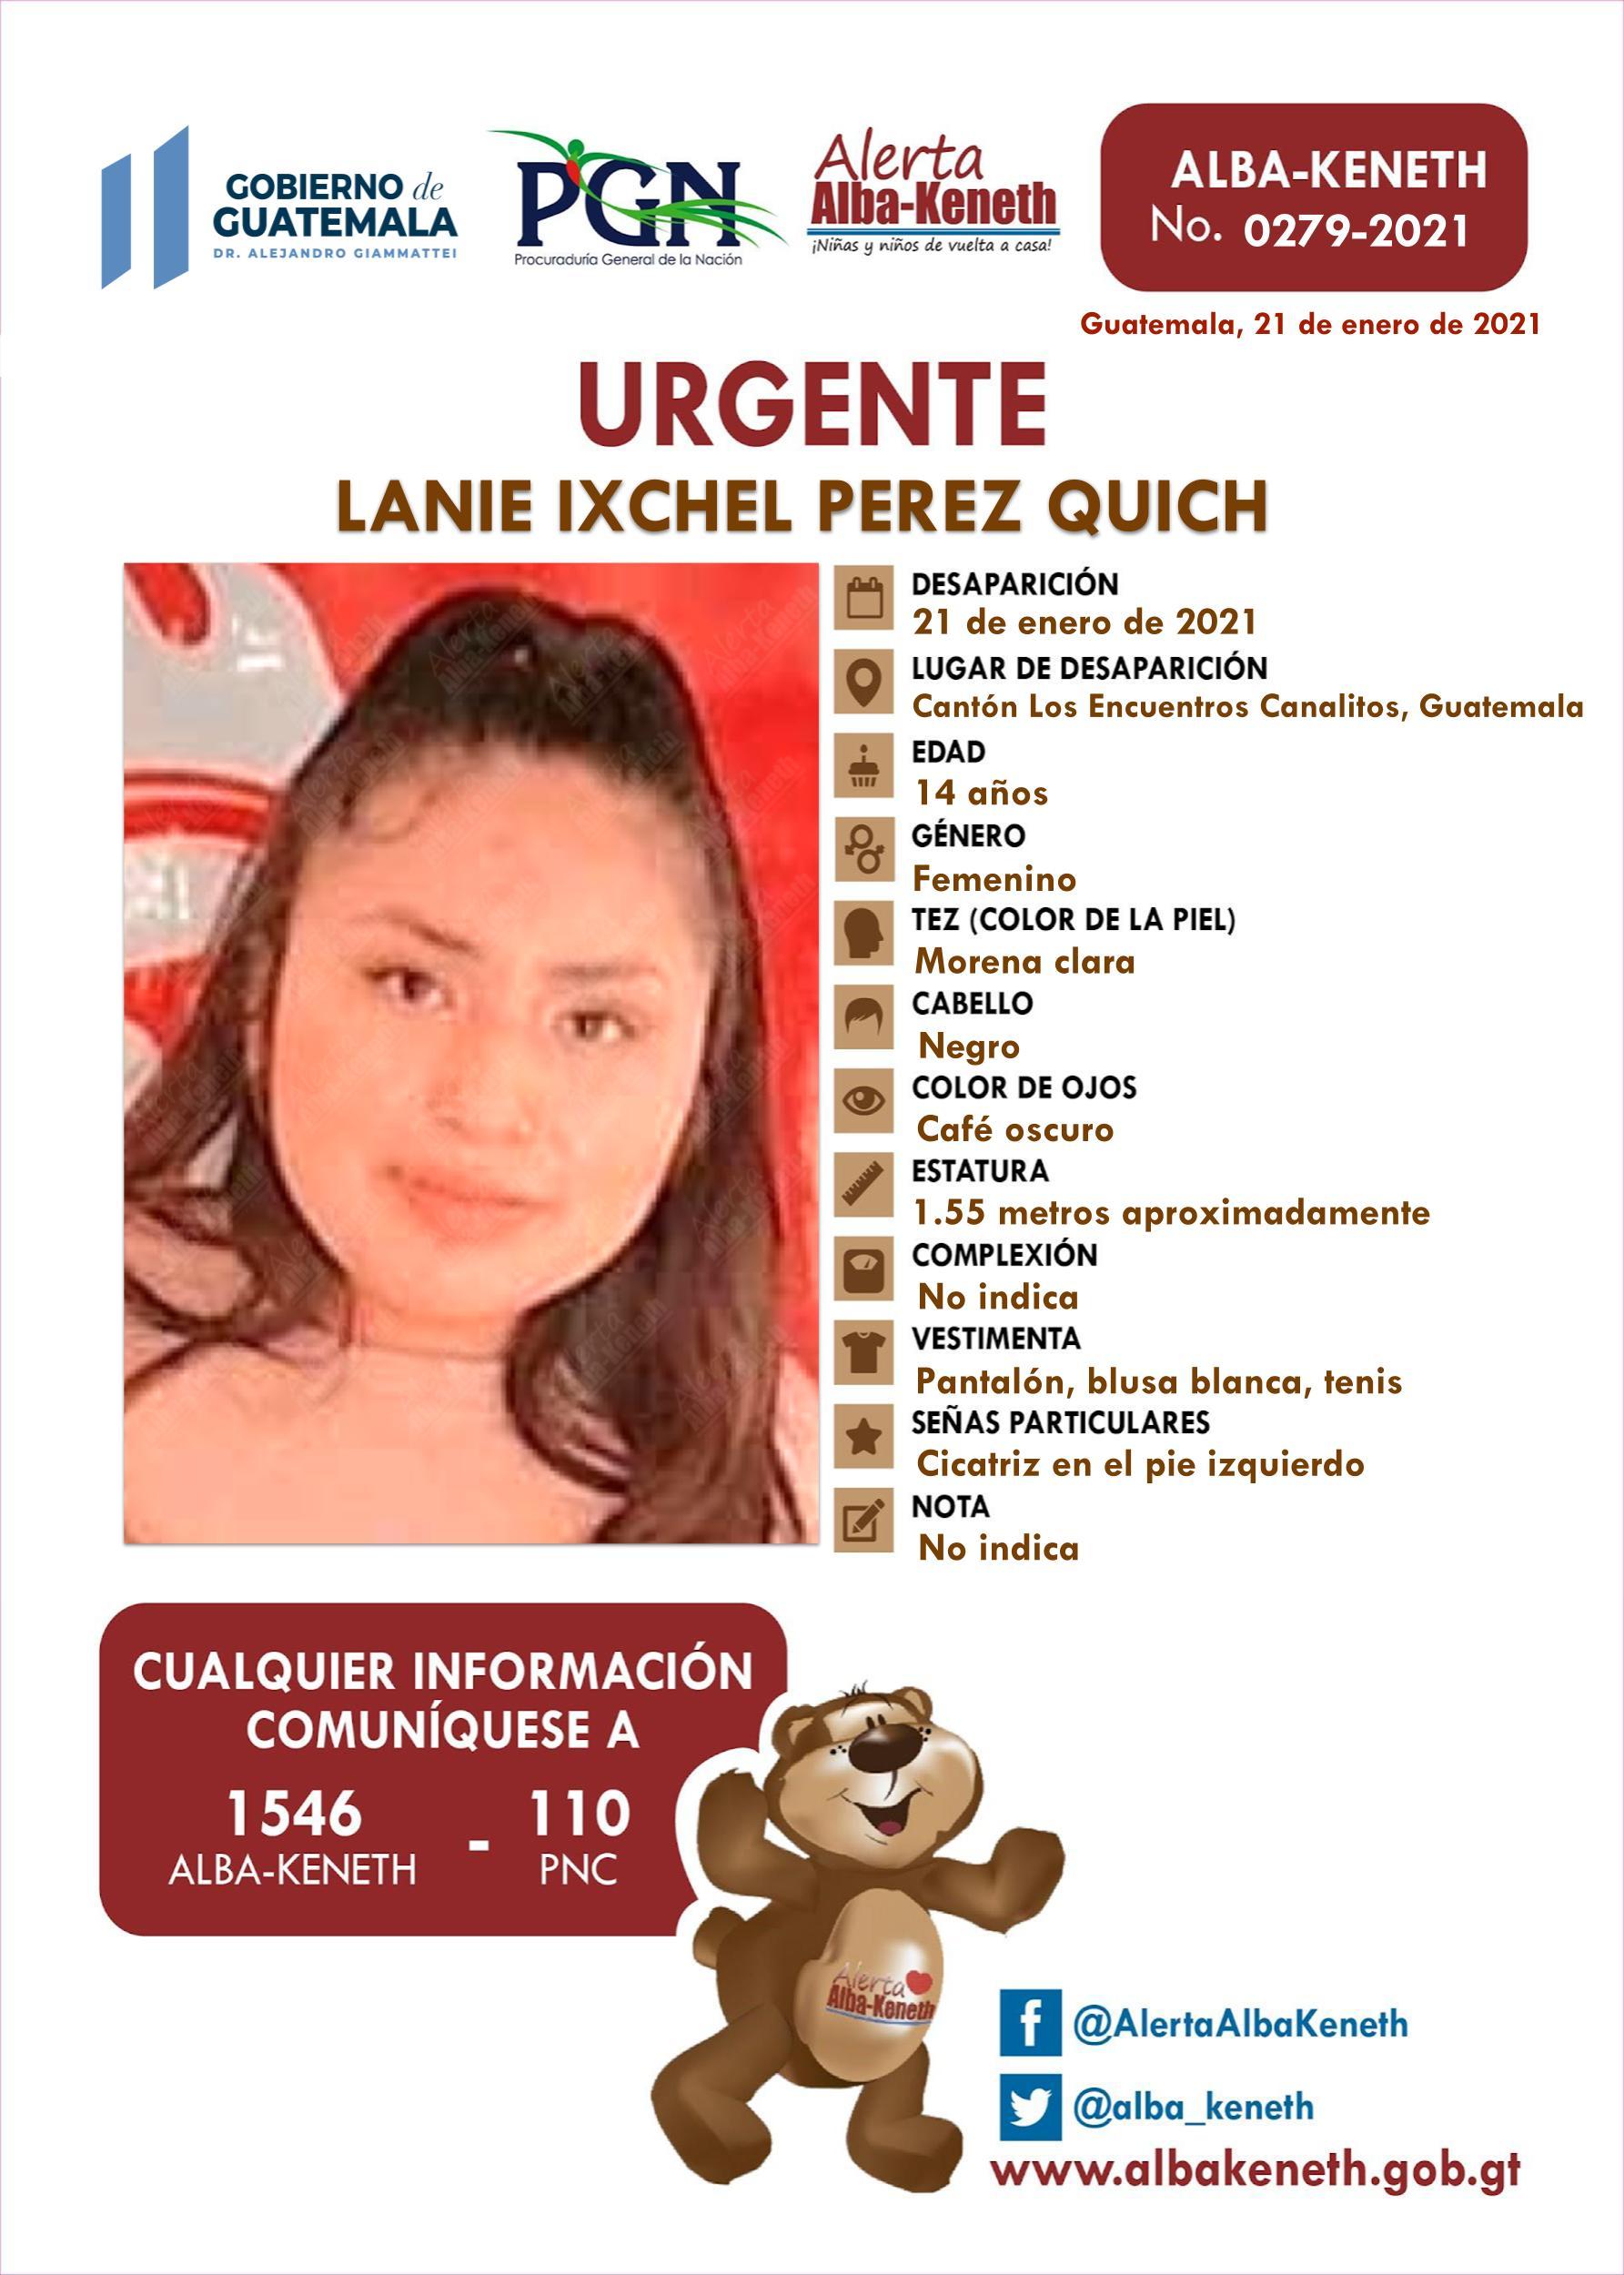 Lanie Ixchel Perez Quich